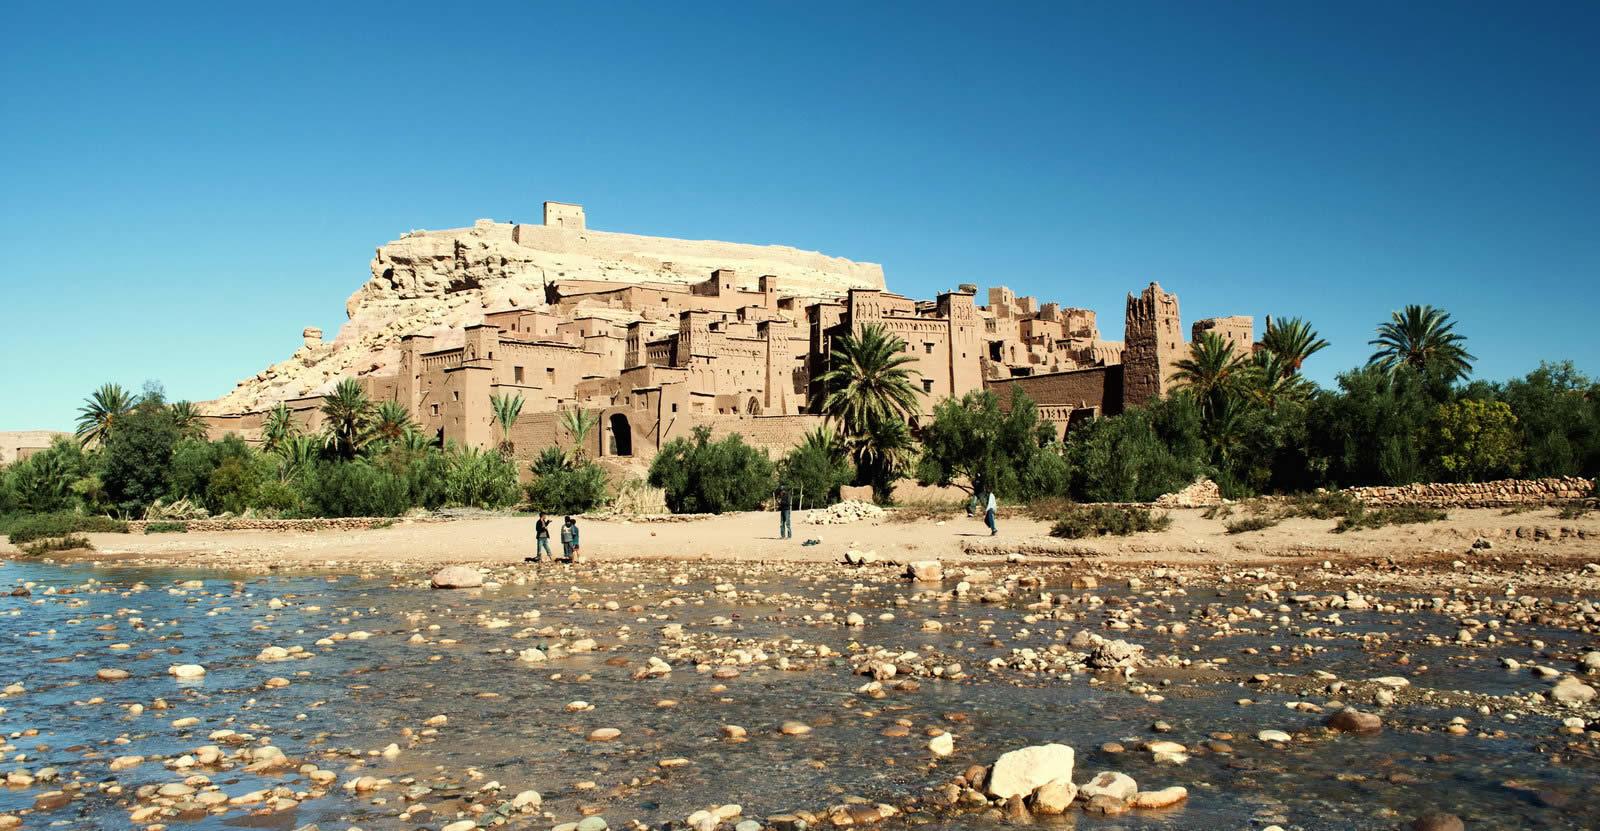 invest-marrakesh-morocco-luxury-properties-modern-villas